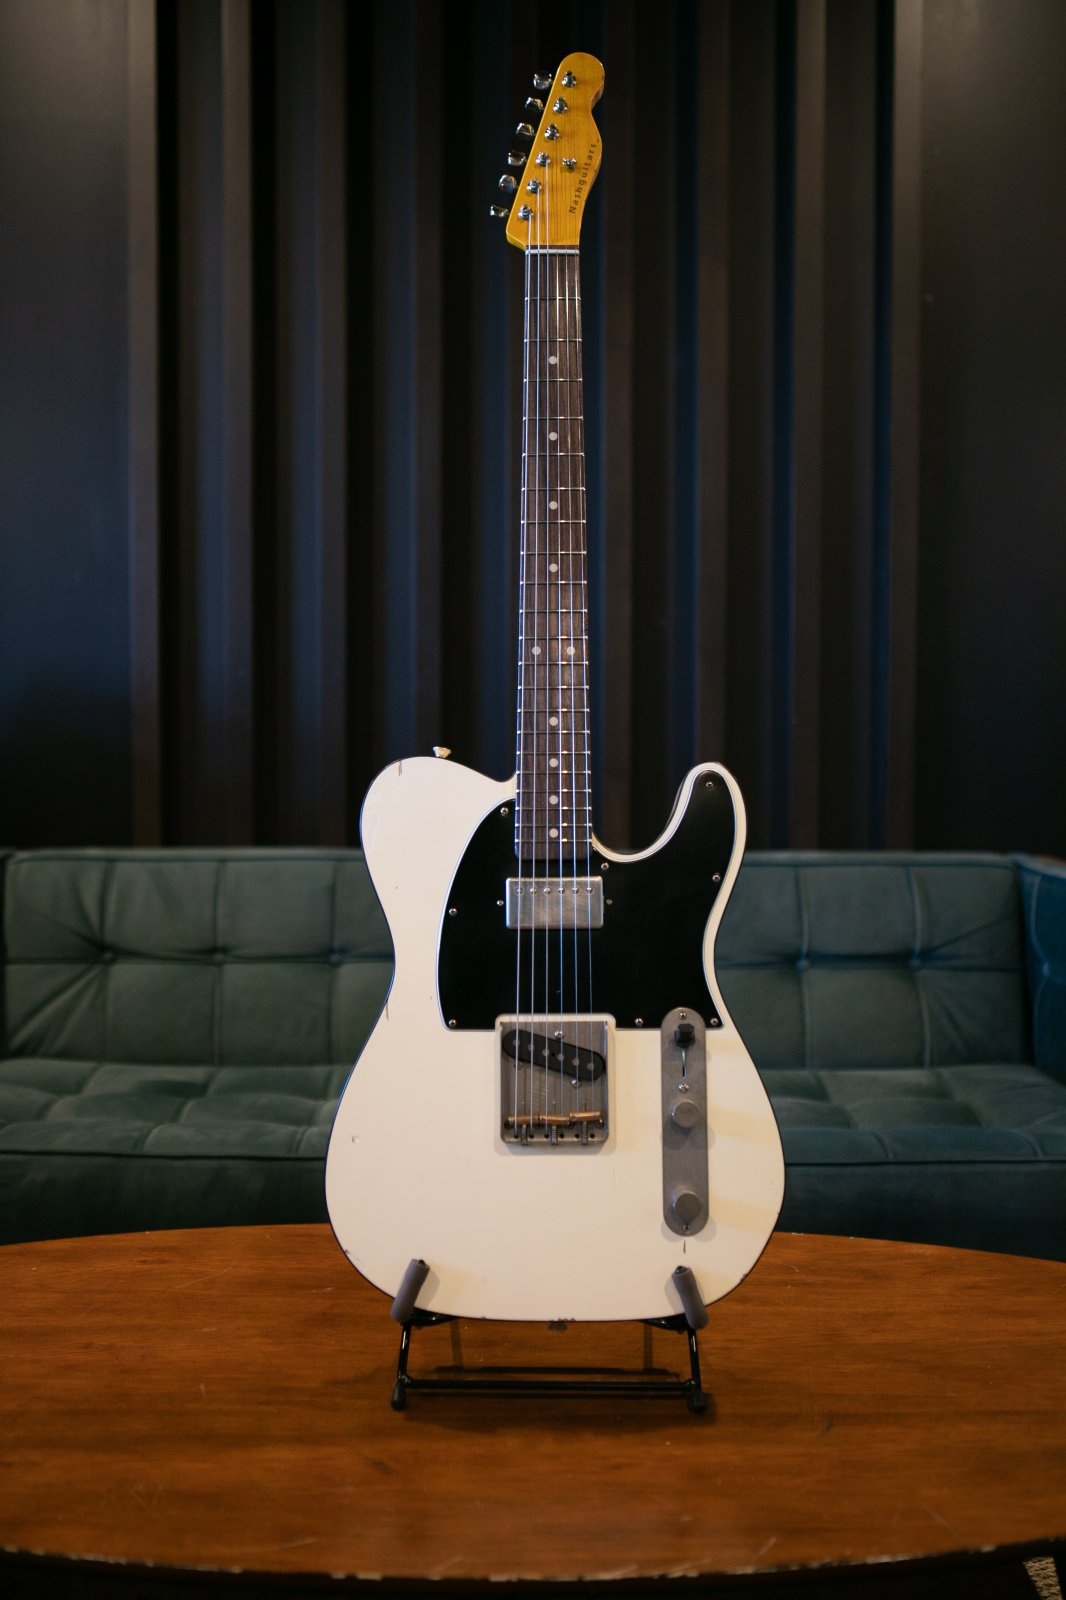 Nash Guitars T-63 (Olympic White with Black Binding)